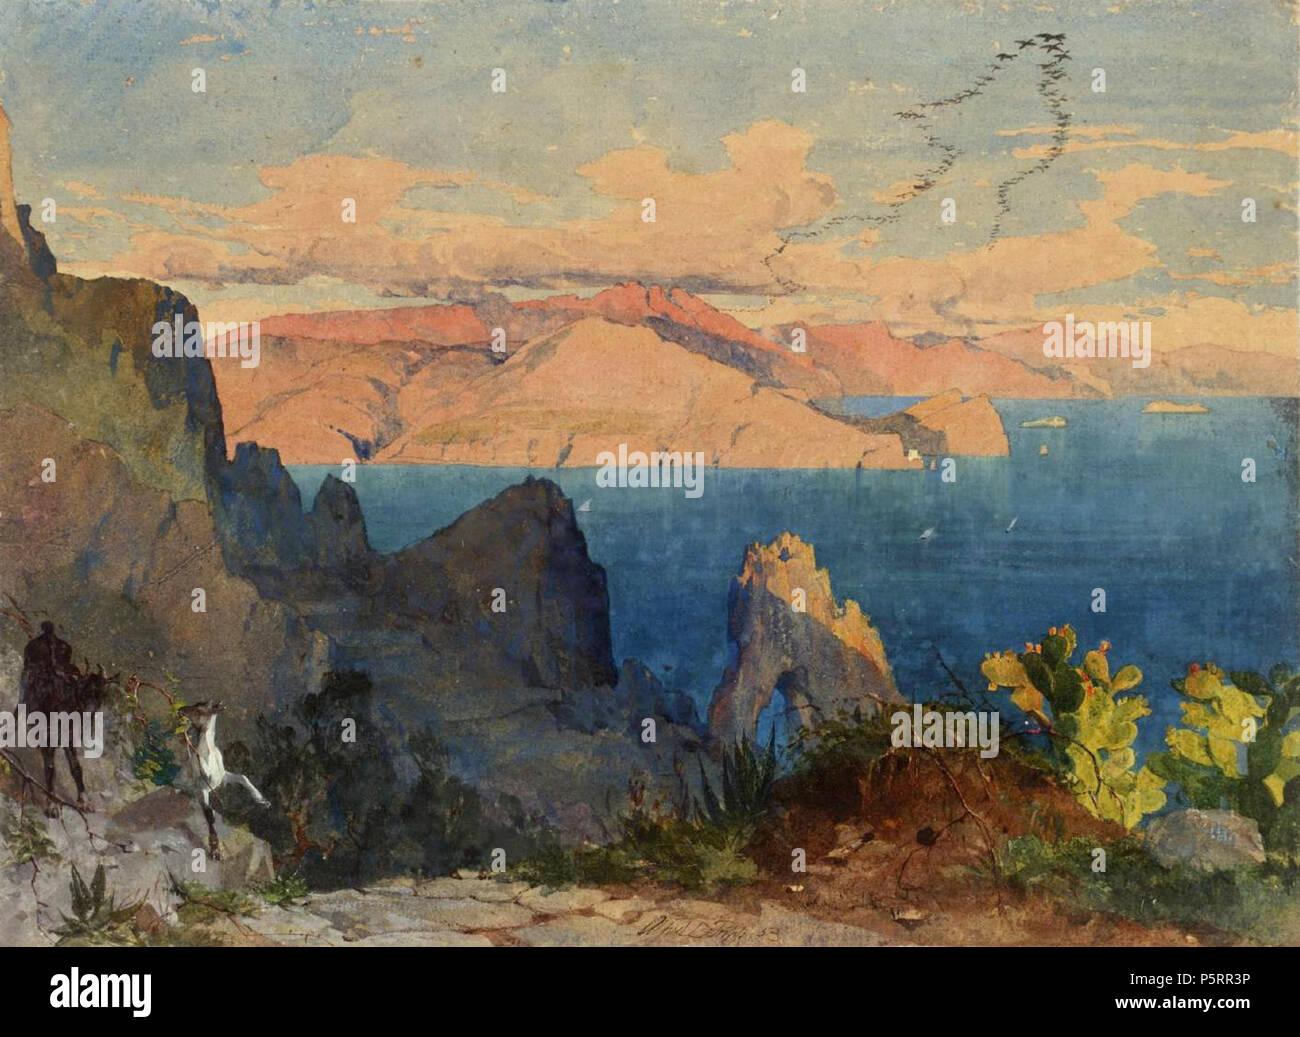 N/A. Capri . 1853. Alfred Downing Fripp (1822-1895) 269 Capri 1853 par Alfred Downing Fripp Photo Stock